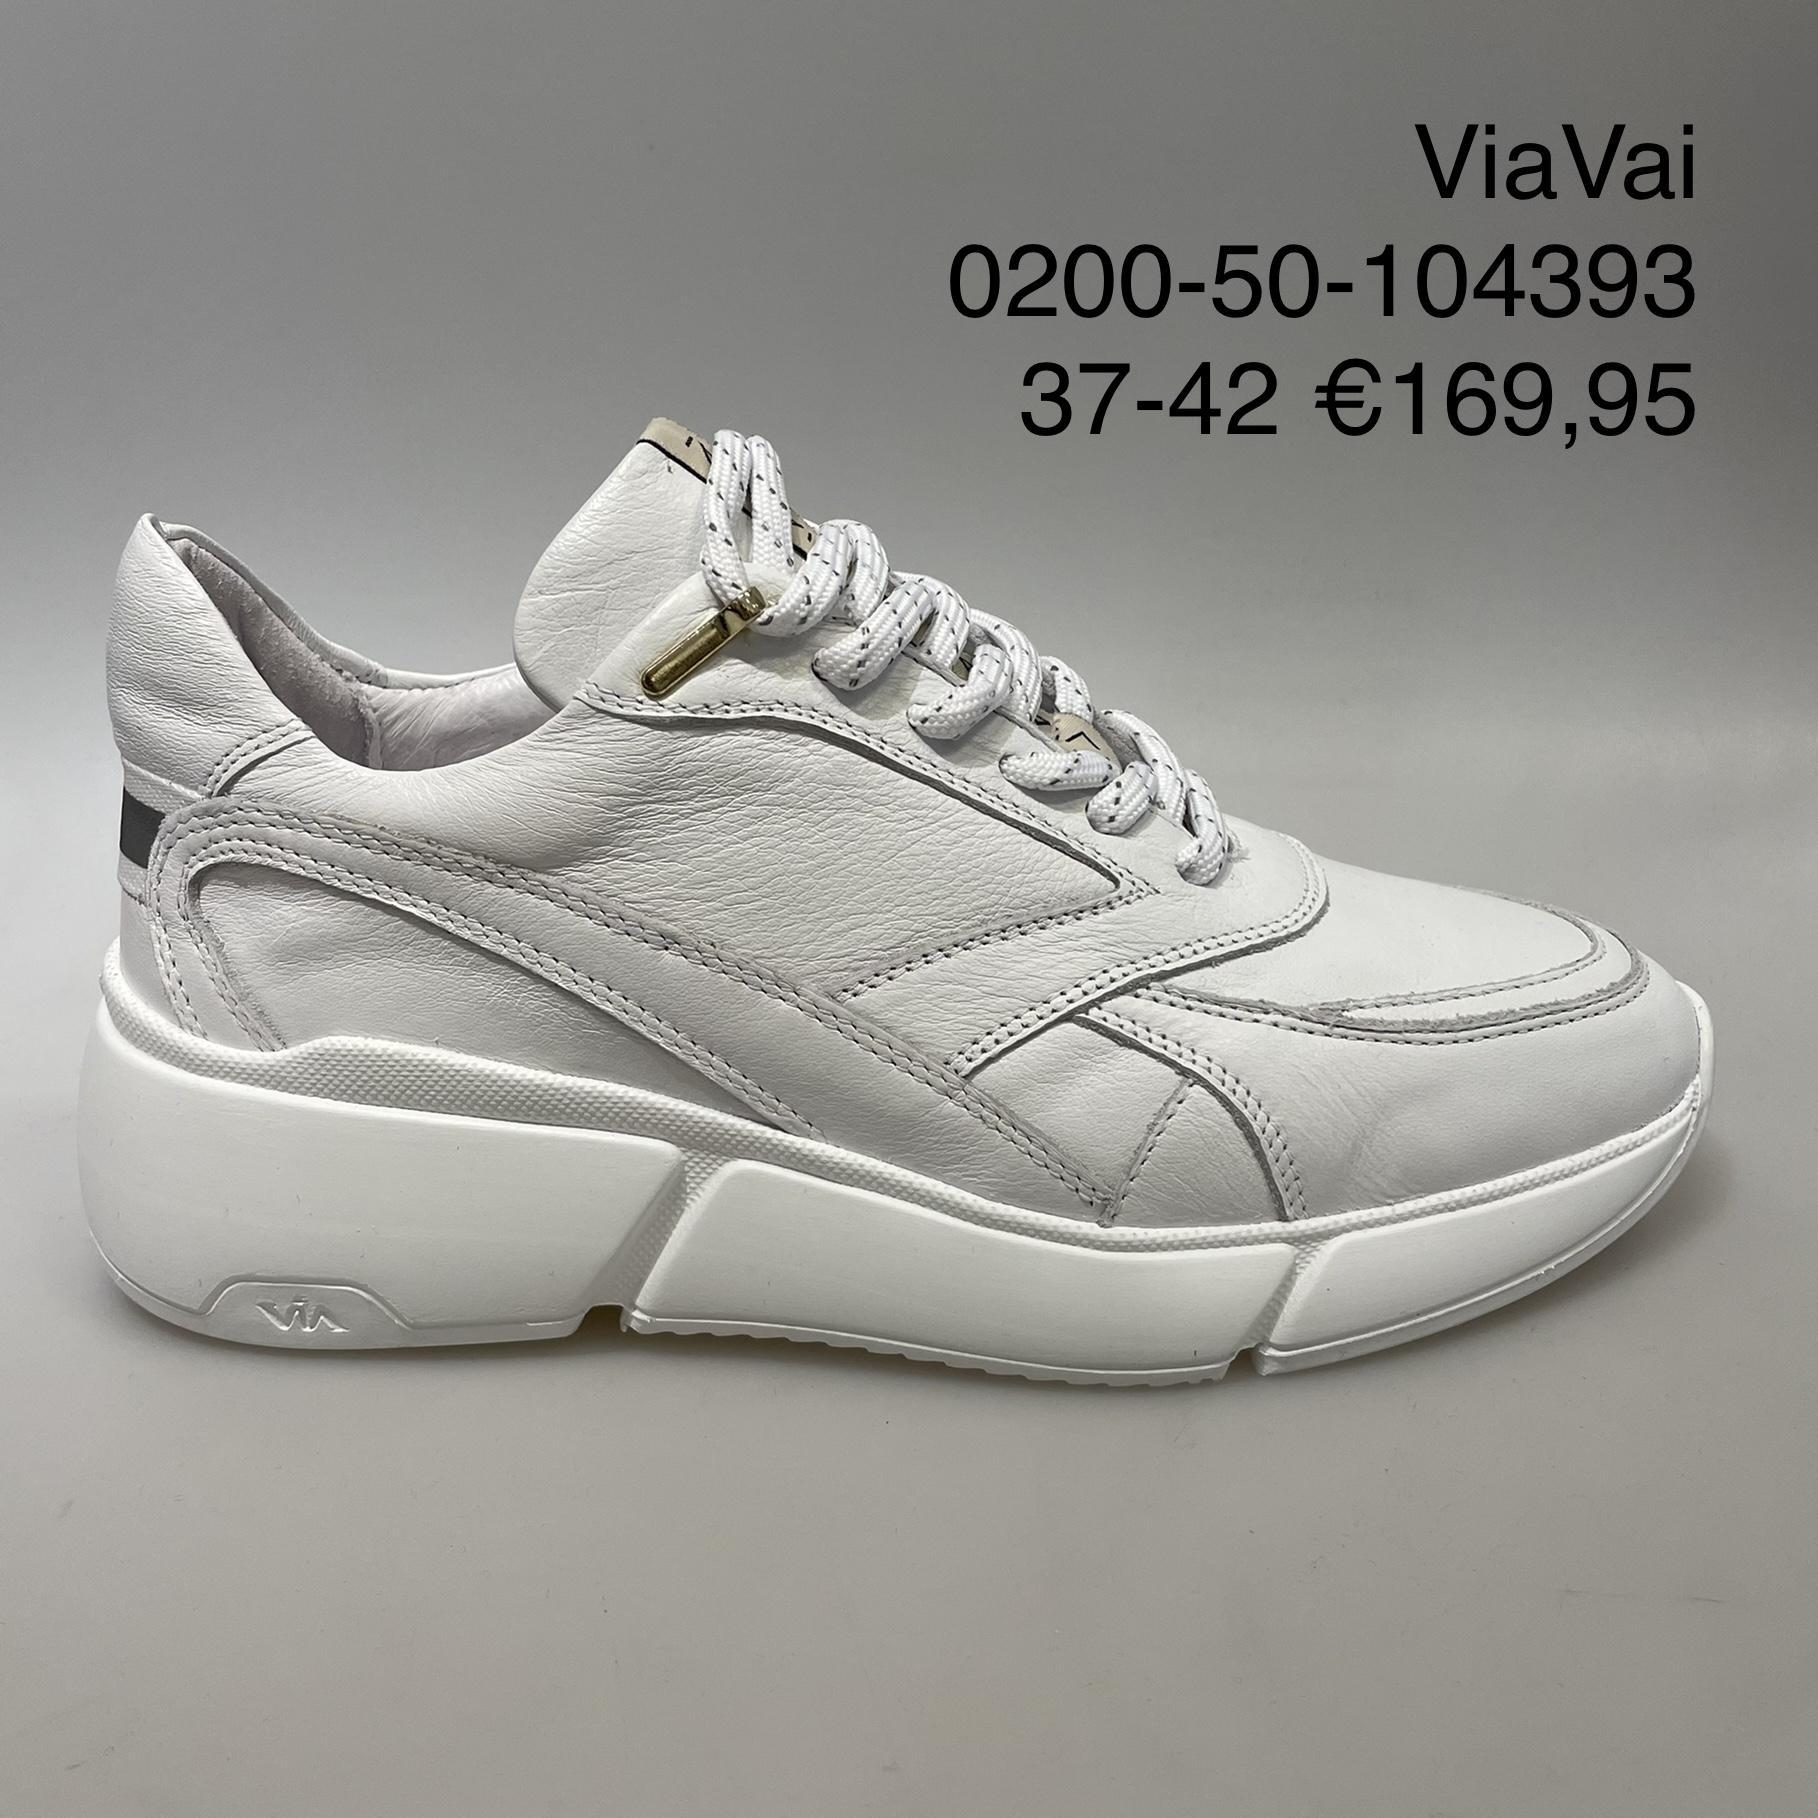 Dames Schoenen 3